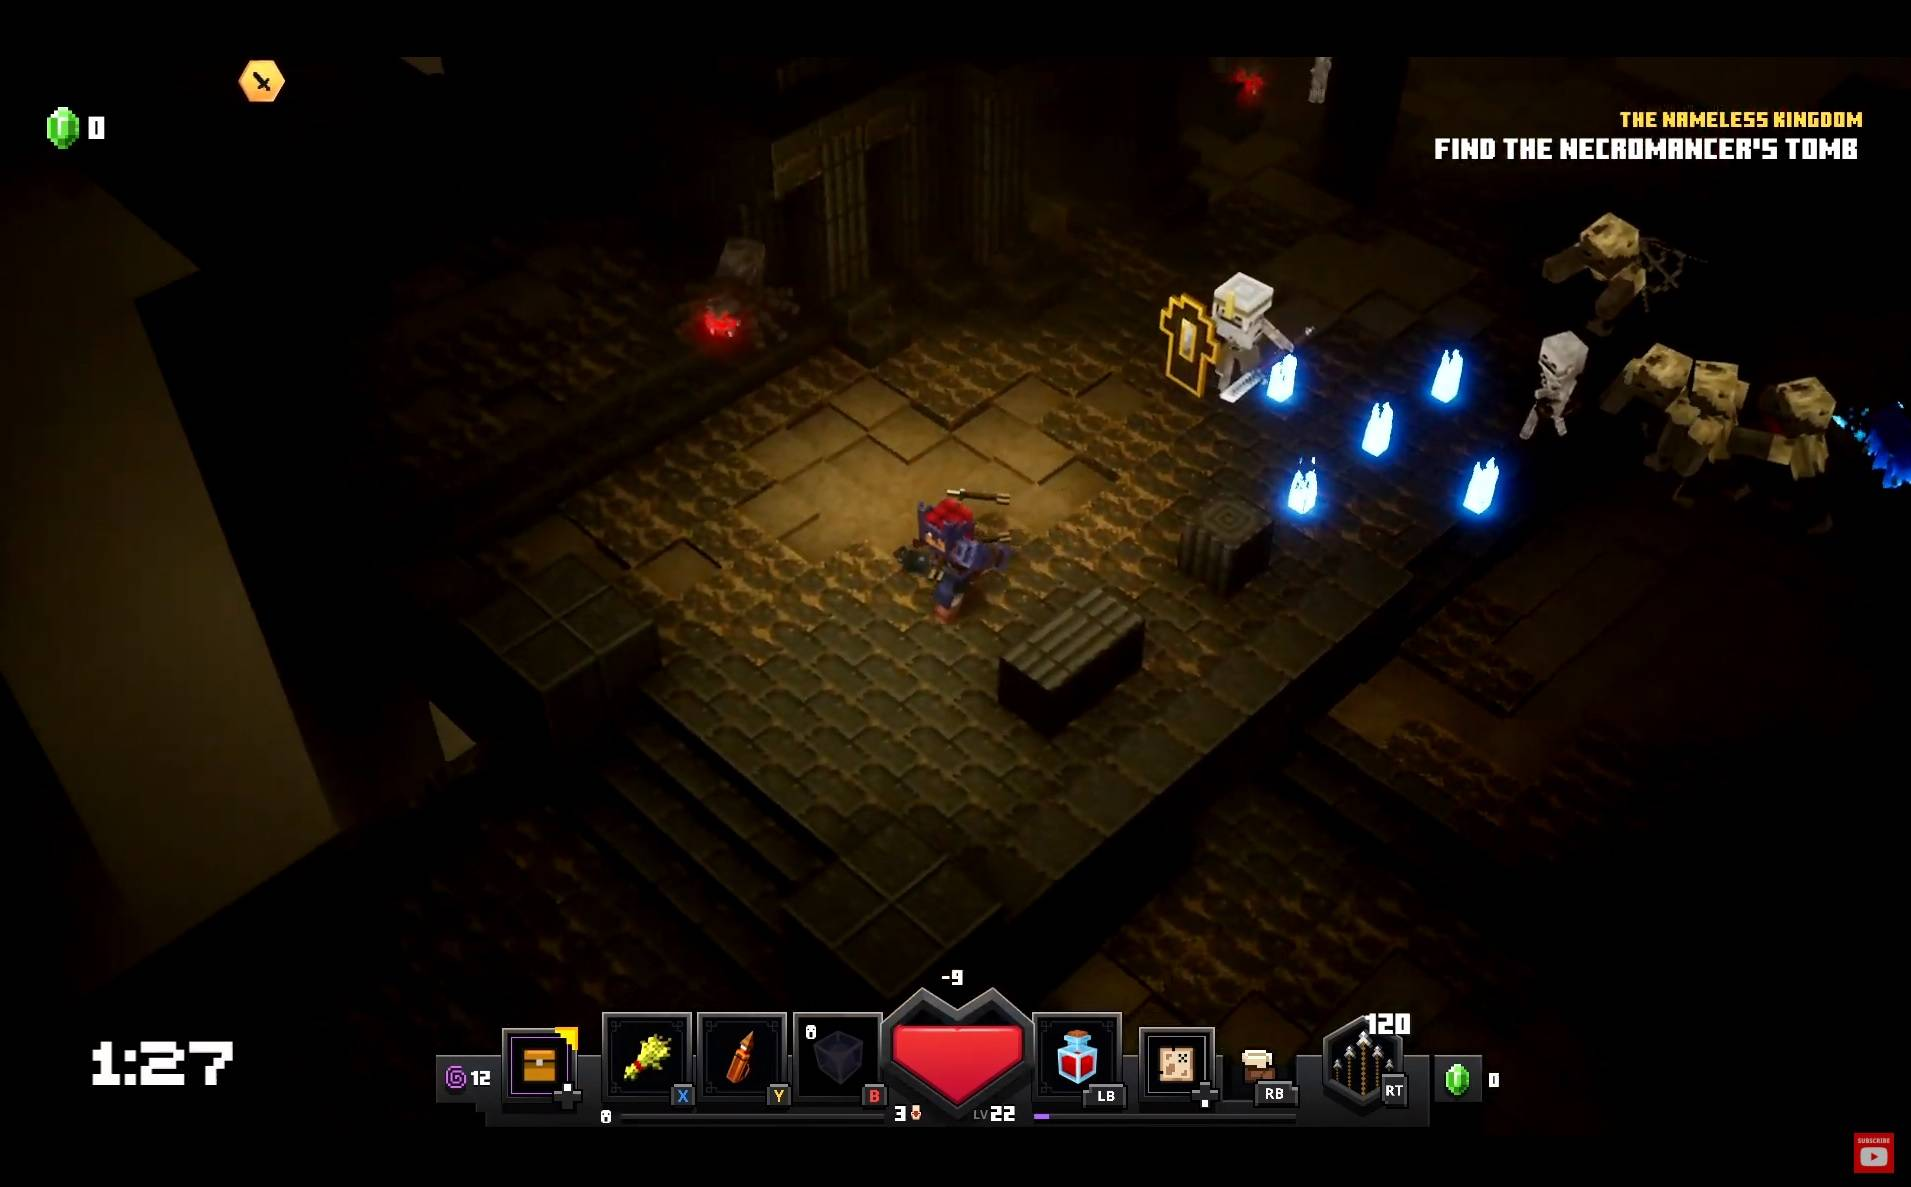 minecraft dungeons demo gameplay rozgrywka